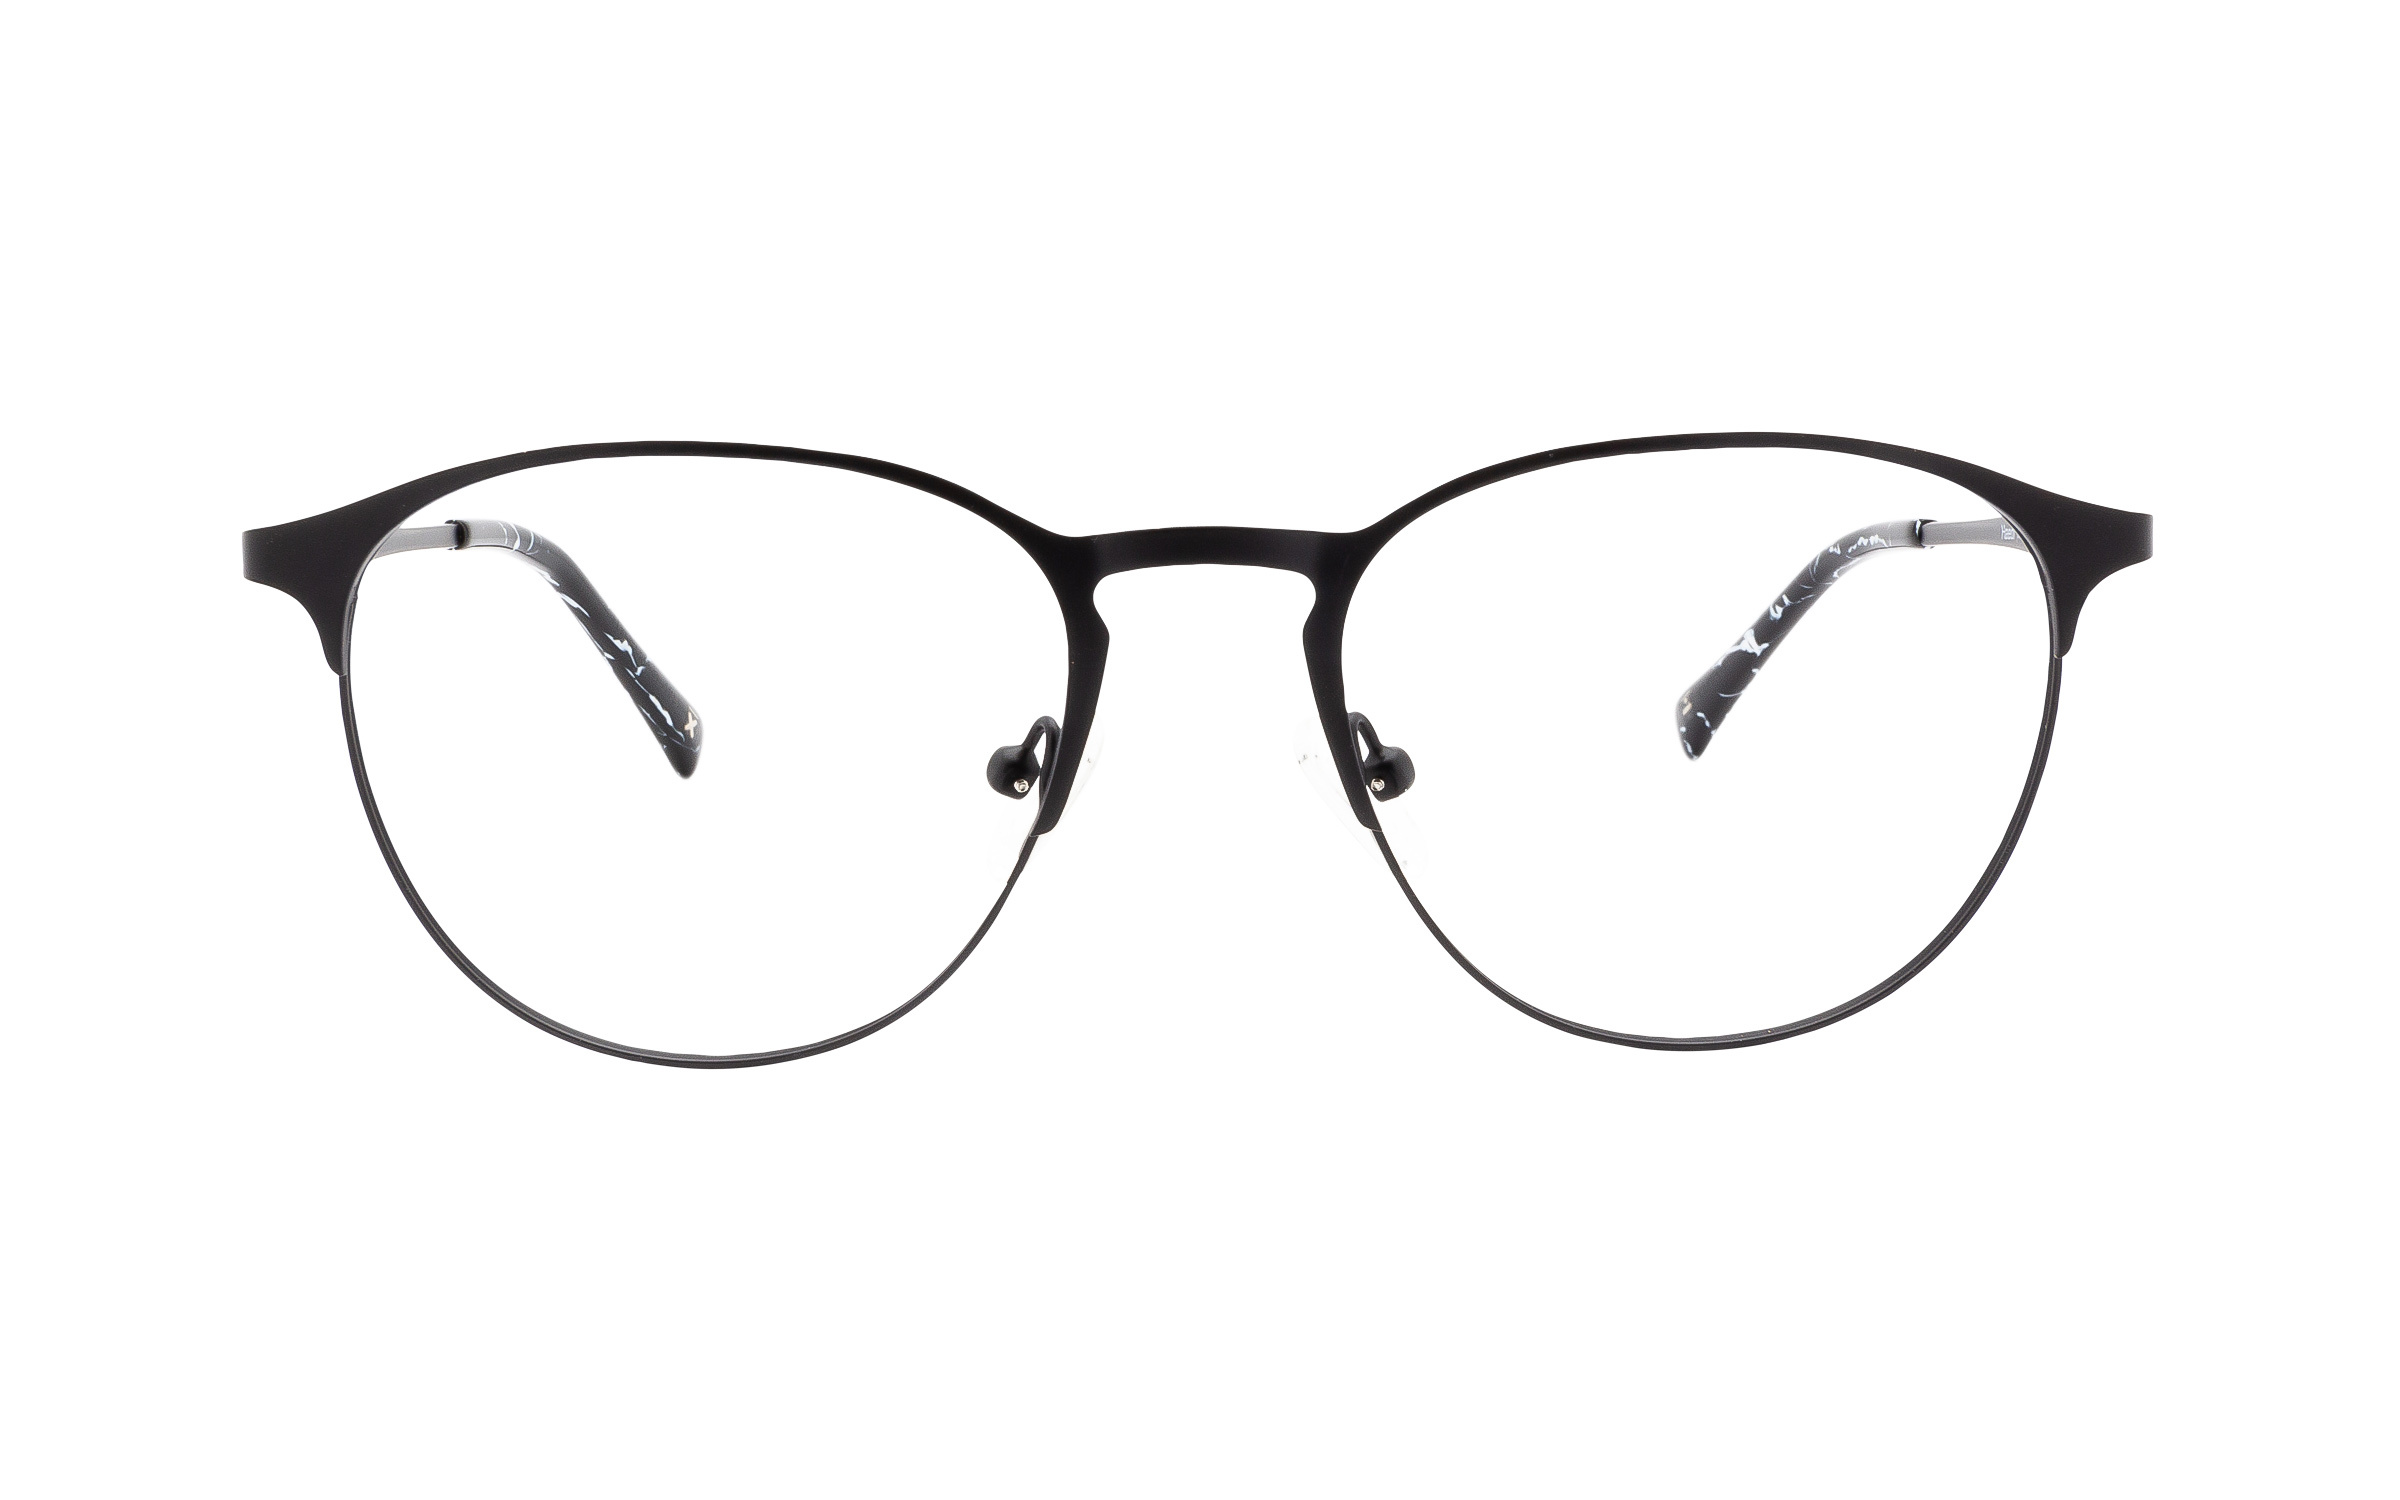 http://www.coastal.com/ - Derek Cardigan Haedi DC219 C01 (51) Eyeglasses and Frame in Matte Black | Metal – Online Coastal